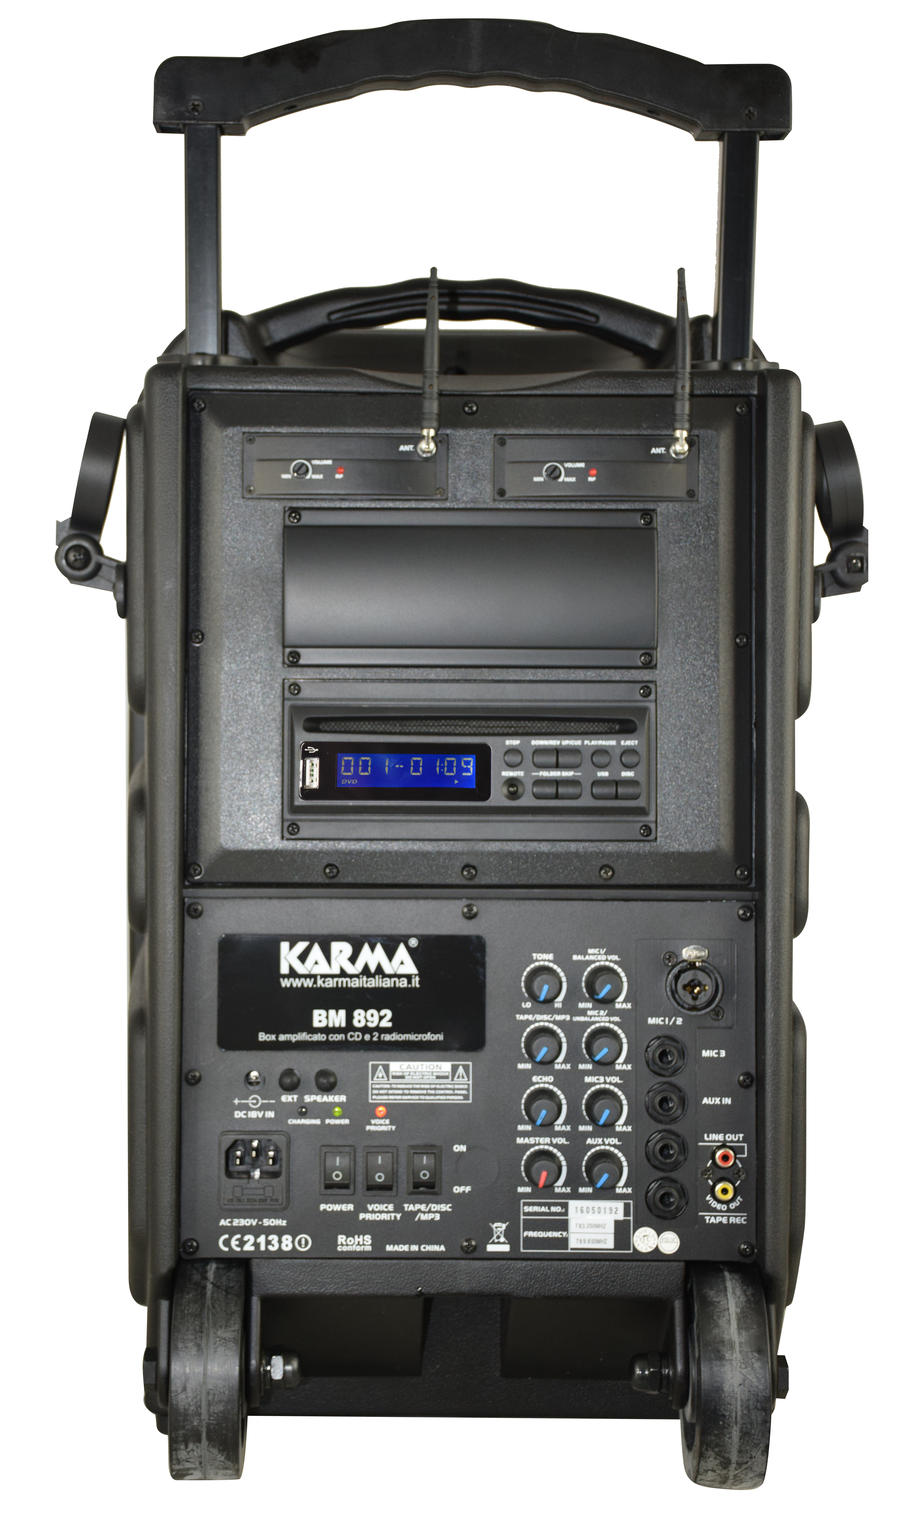 karma bm 892 100w haut parleur amplifi avec 2 microphones sans fil overload. Black Bedroom Furniture Sets. Home Design Ideas